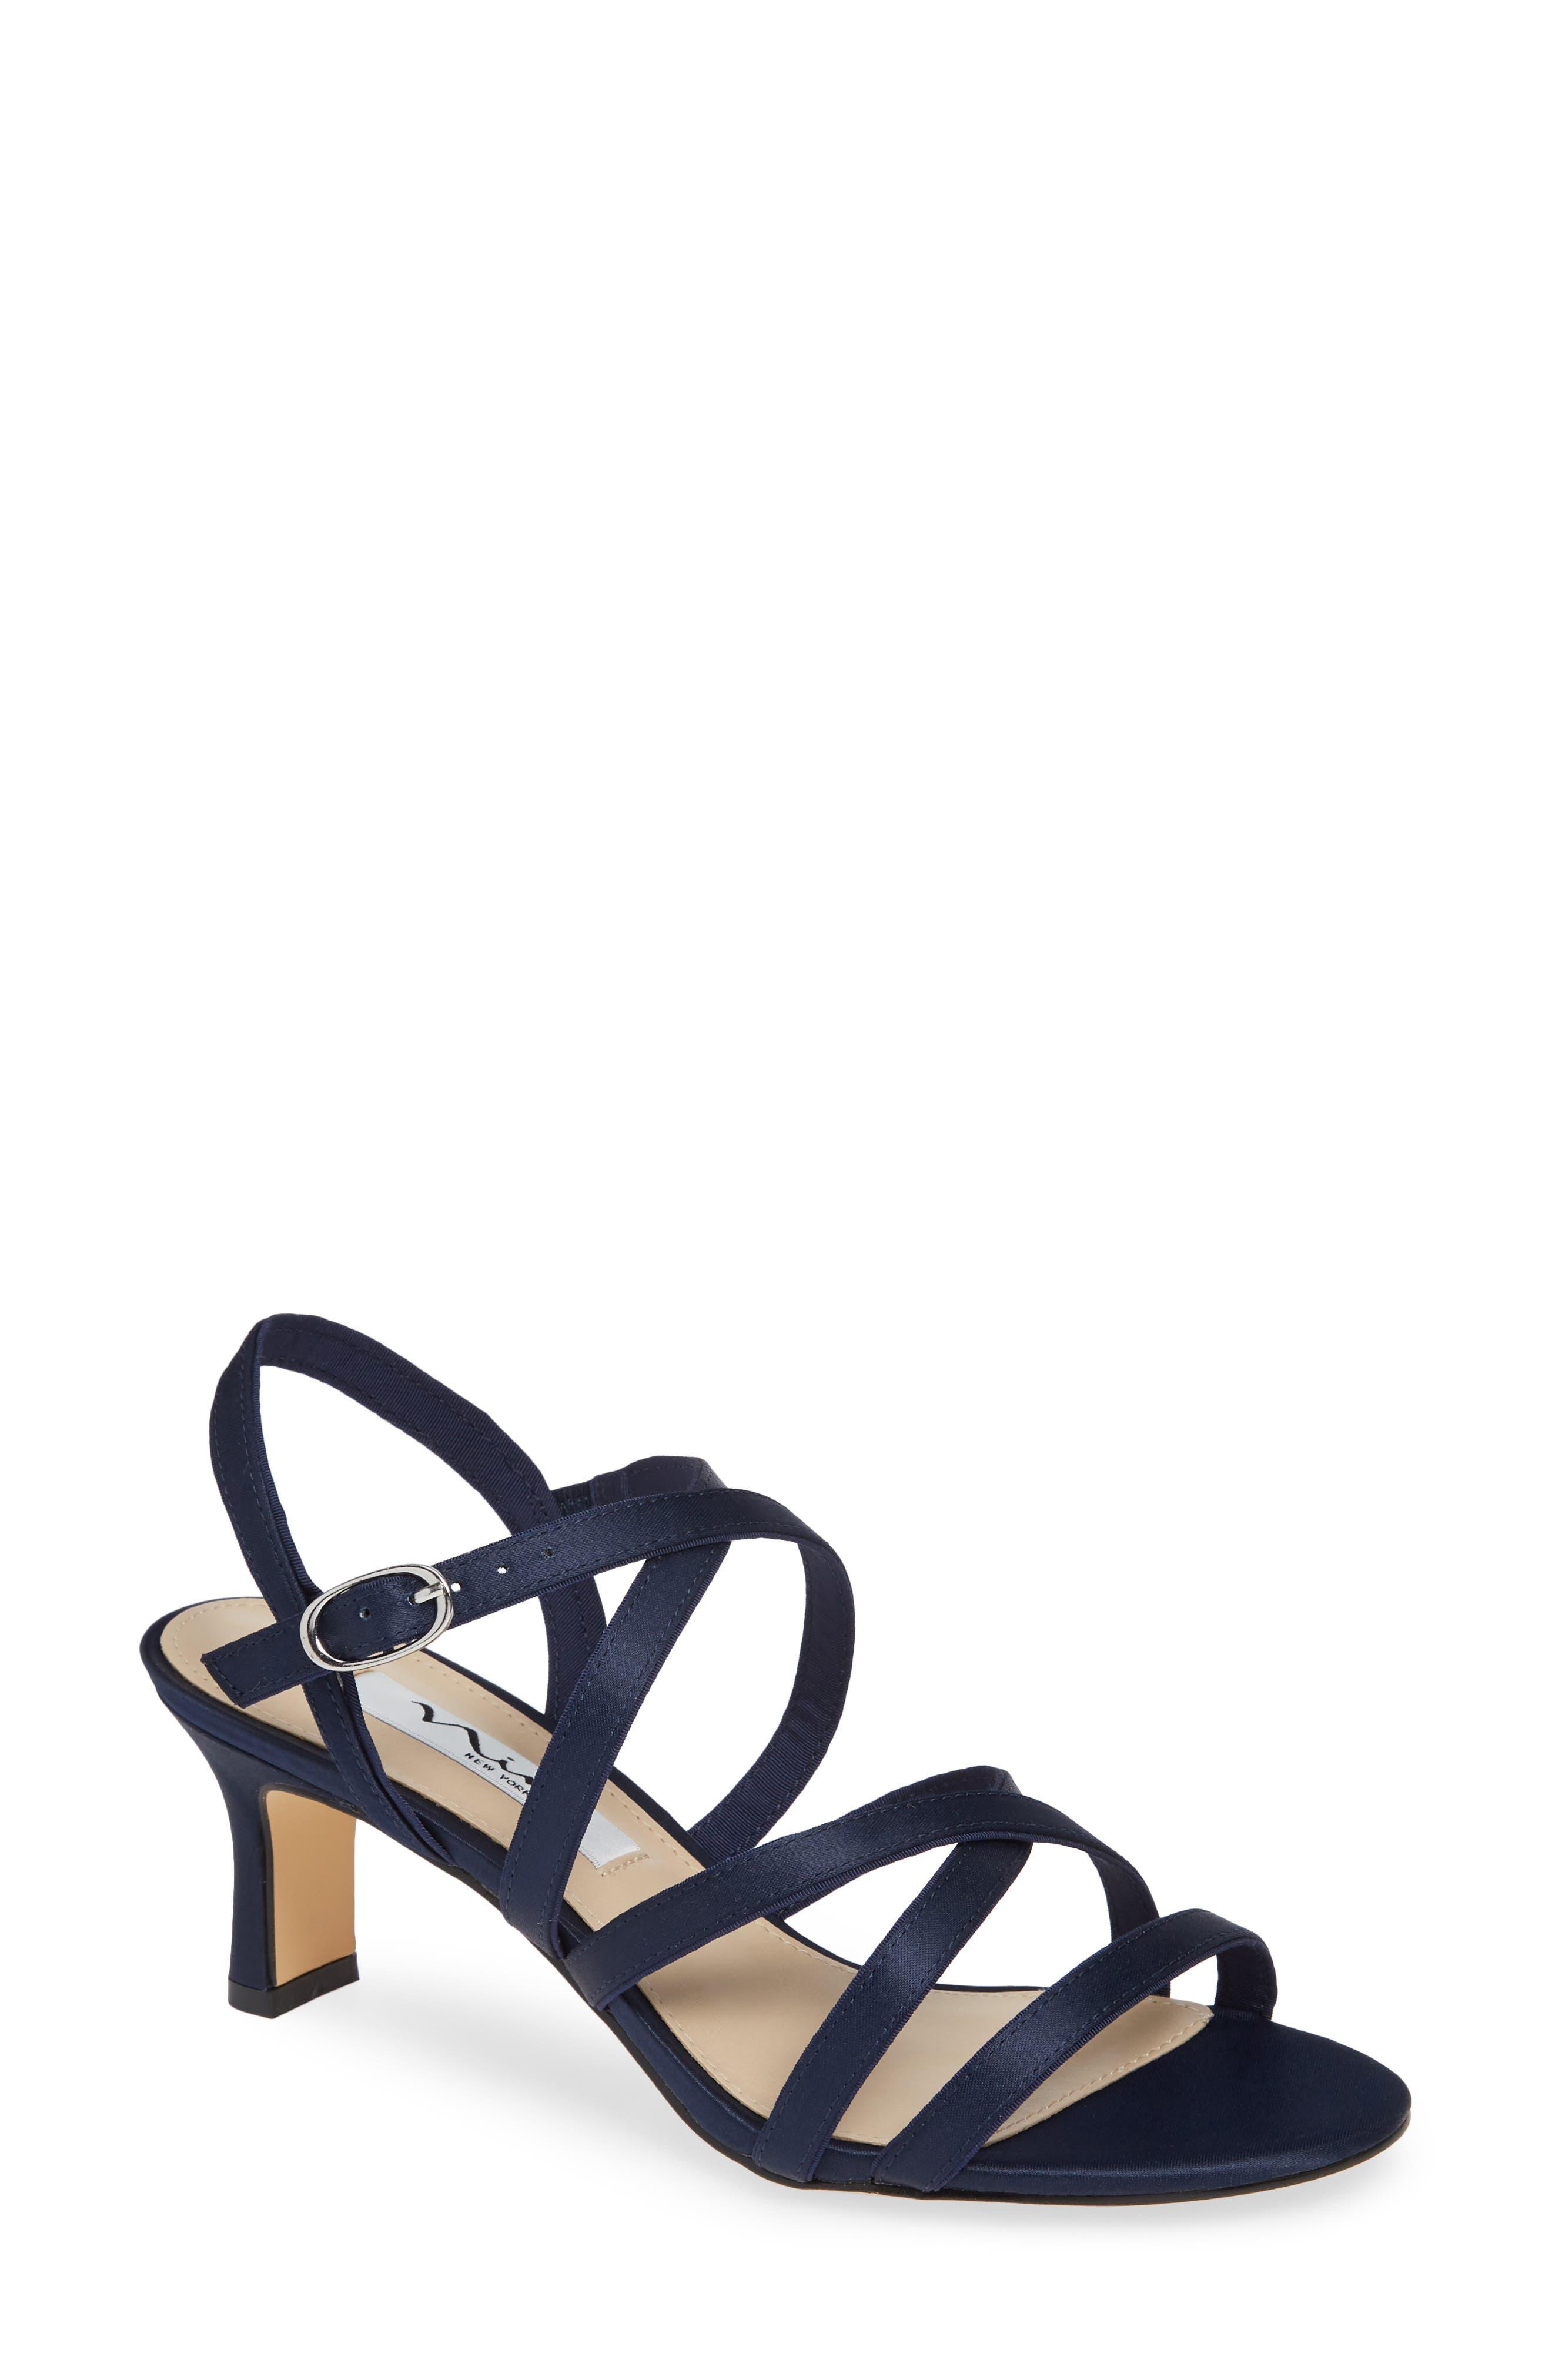 Genaya Strappy Evening Sandal,                             Main thumbnail 1, color,                             Navy Satin